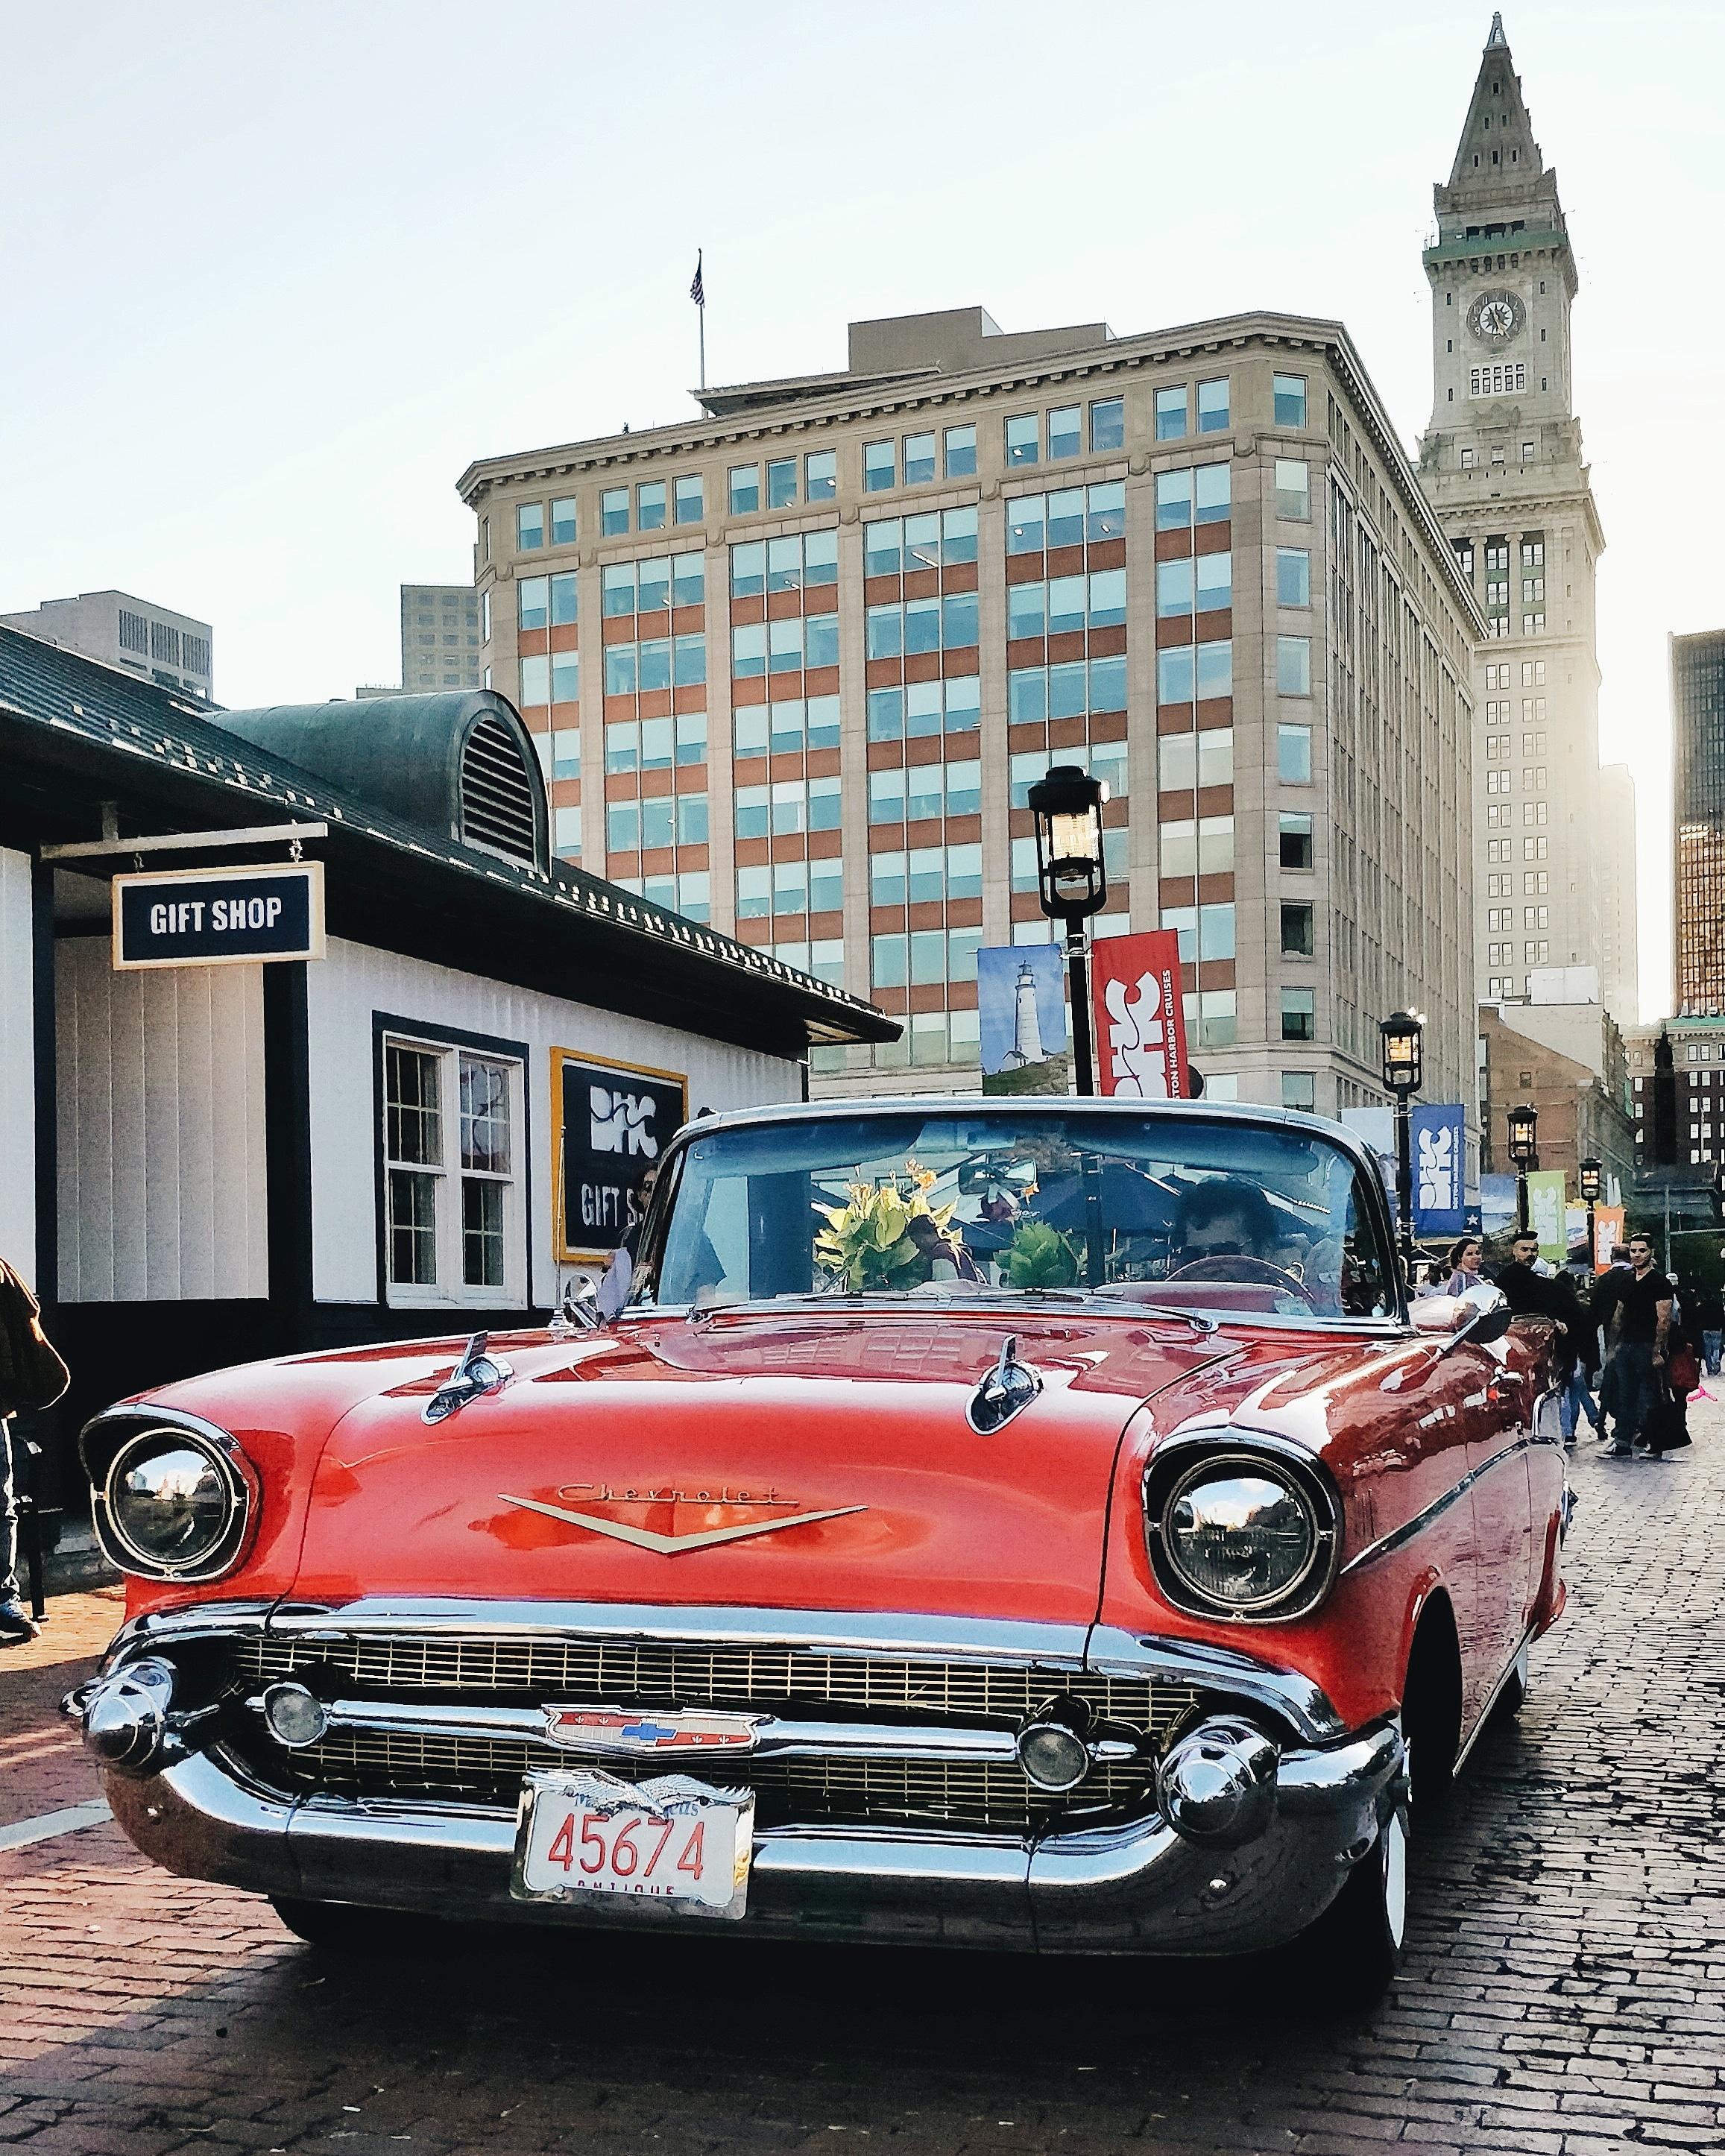 @mbphotographs - Seaport District, Boston, MA